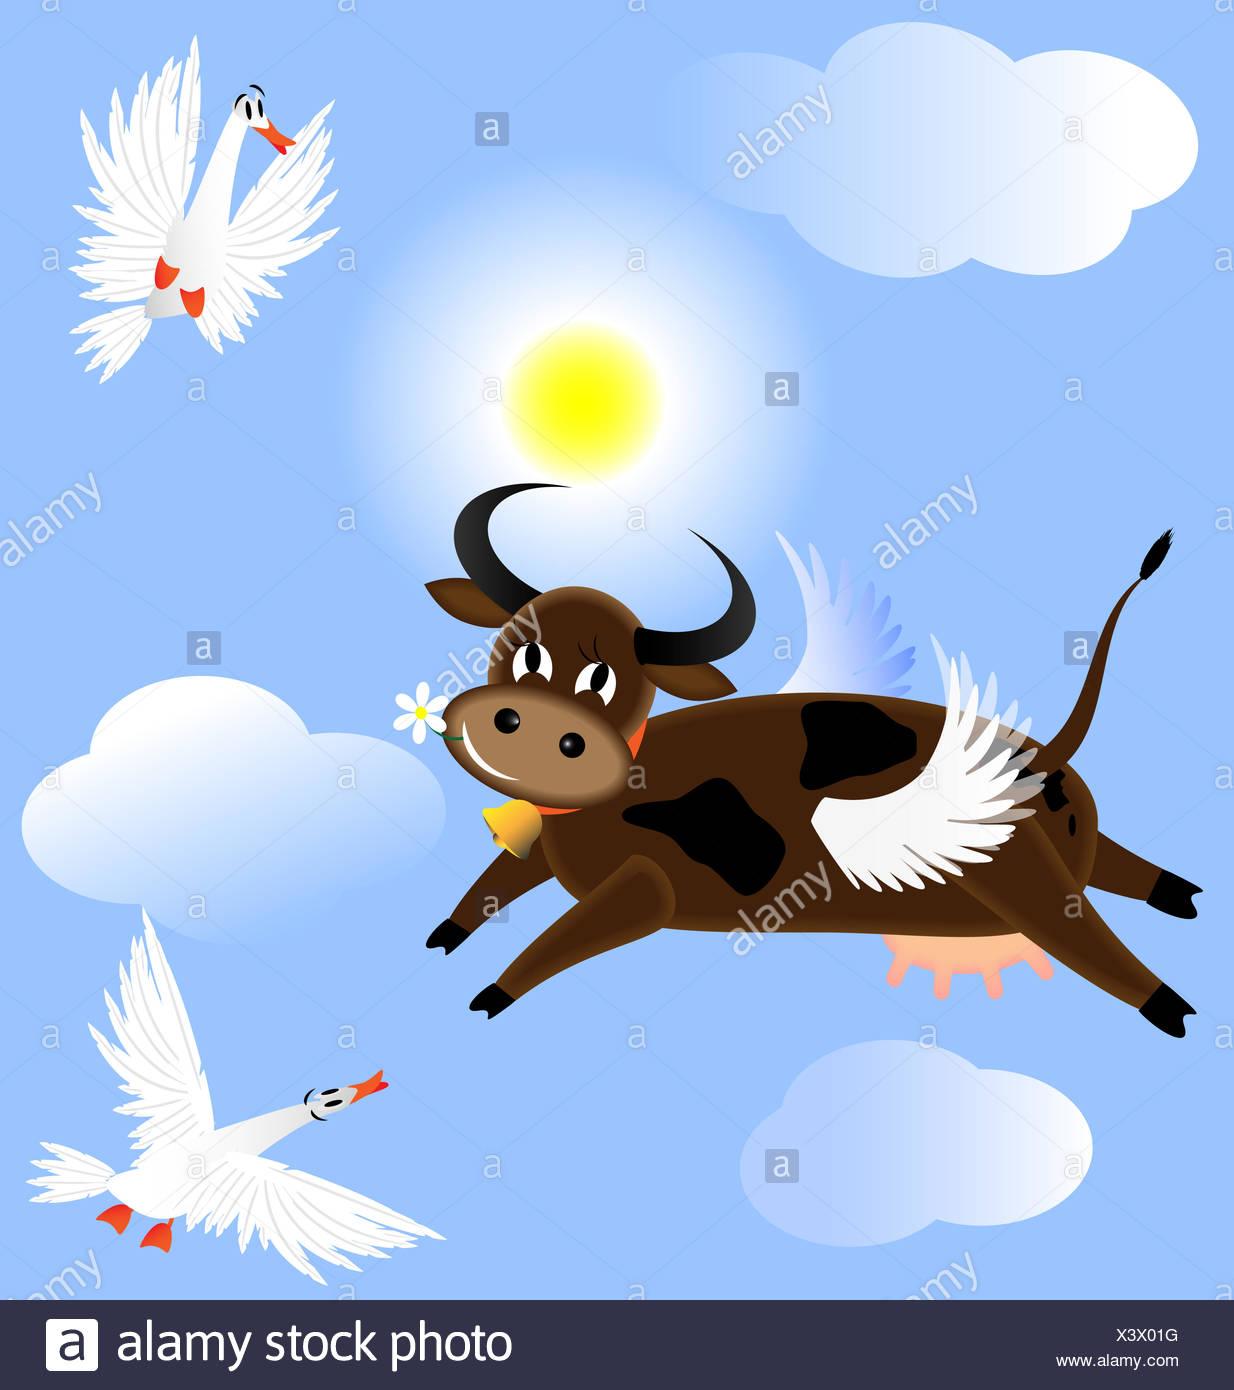 Flying Cow Stock Photo 277780652 Alamy